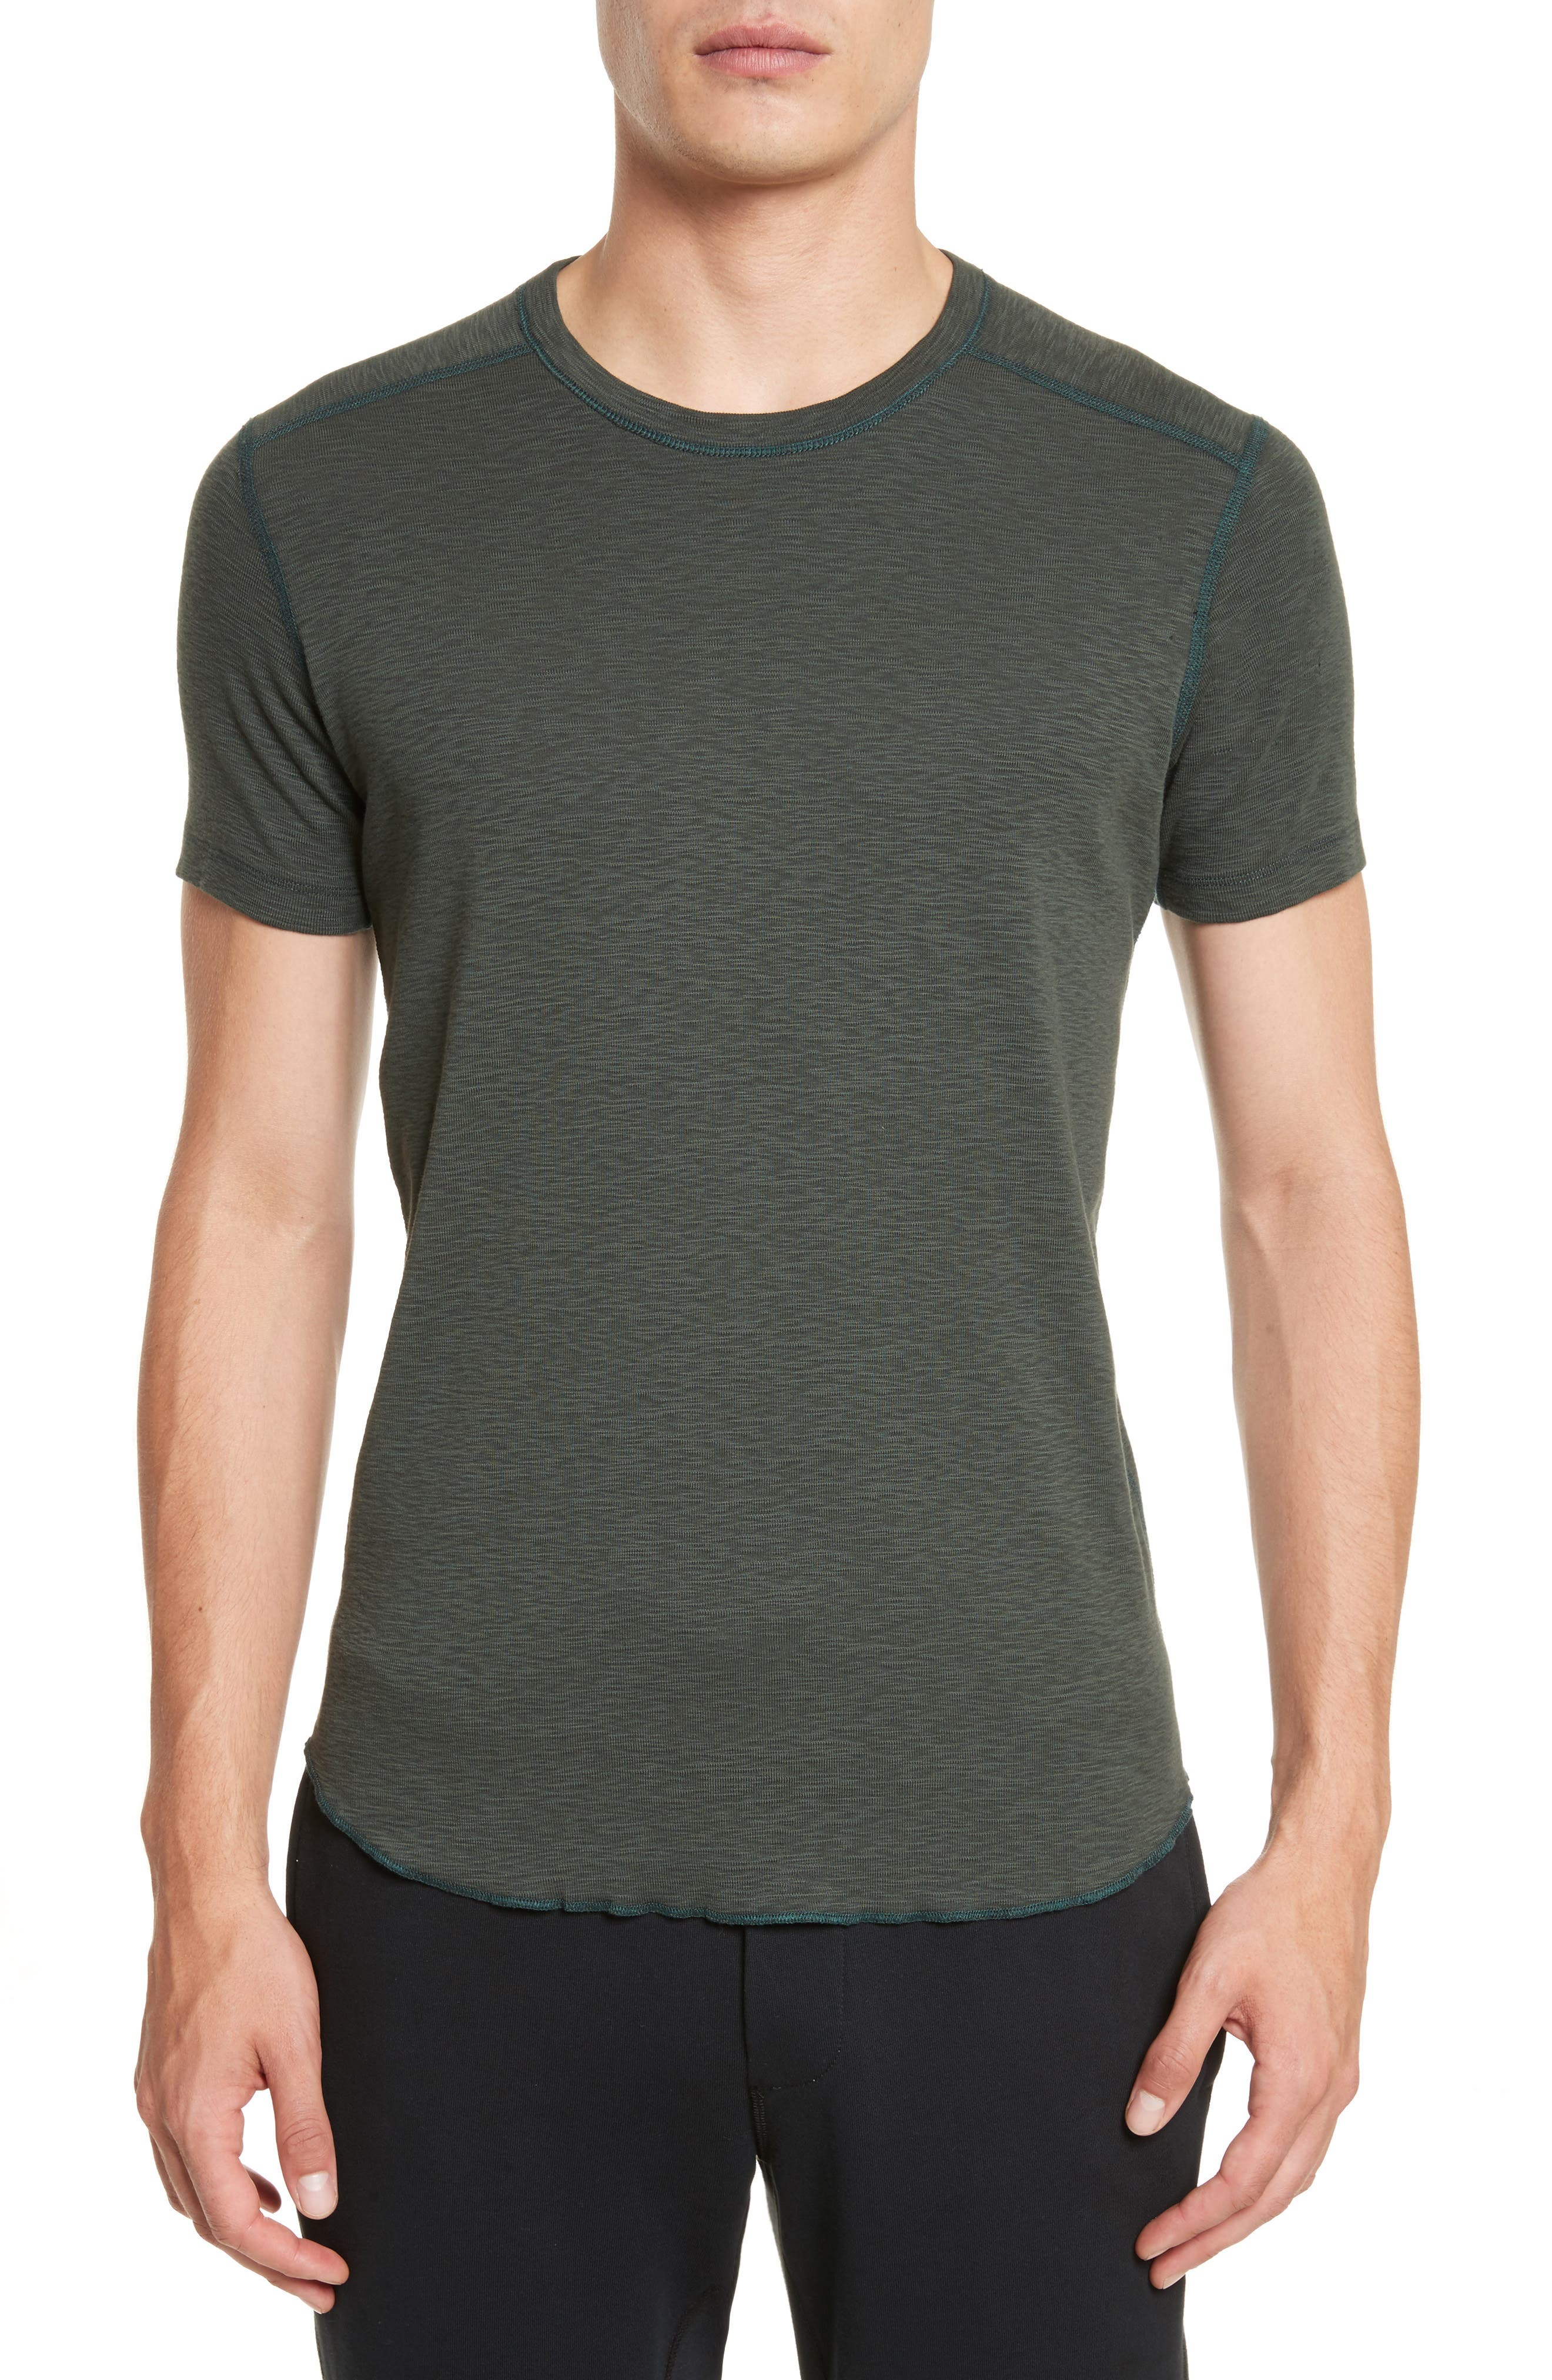 Main Image - wings + horns Ribbed Slub Cotton T-Shirt